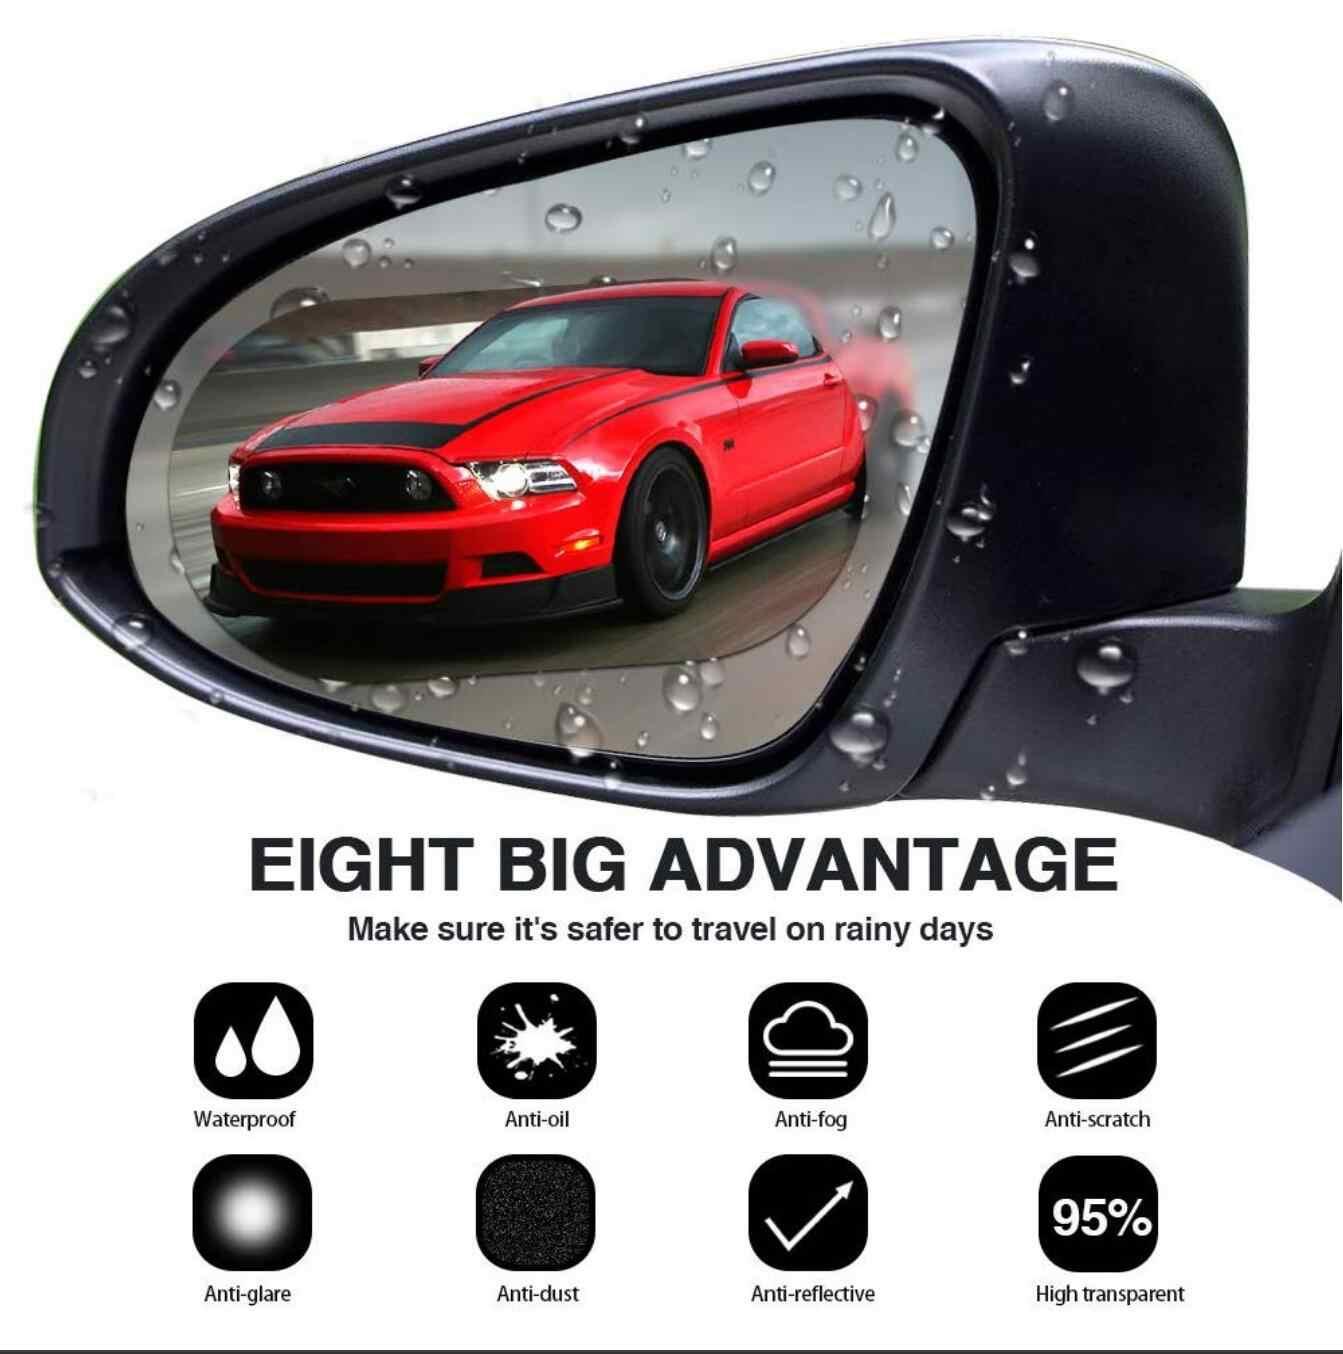 Mobil Kaca Film Cermin untuk BMW E46 E39 E38 E90 E60 E36 F30 F30 E34 F10 F20 E92 E38 E91 e53 E70 X5 X3 X6 M M3 5